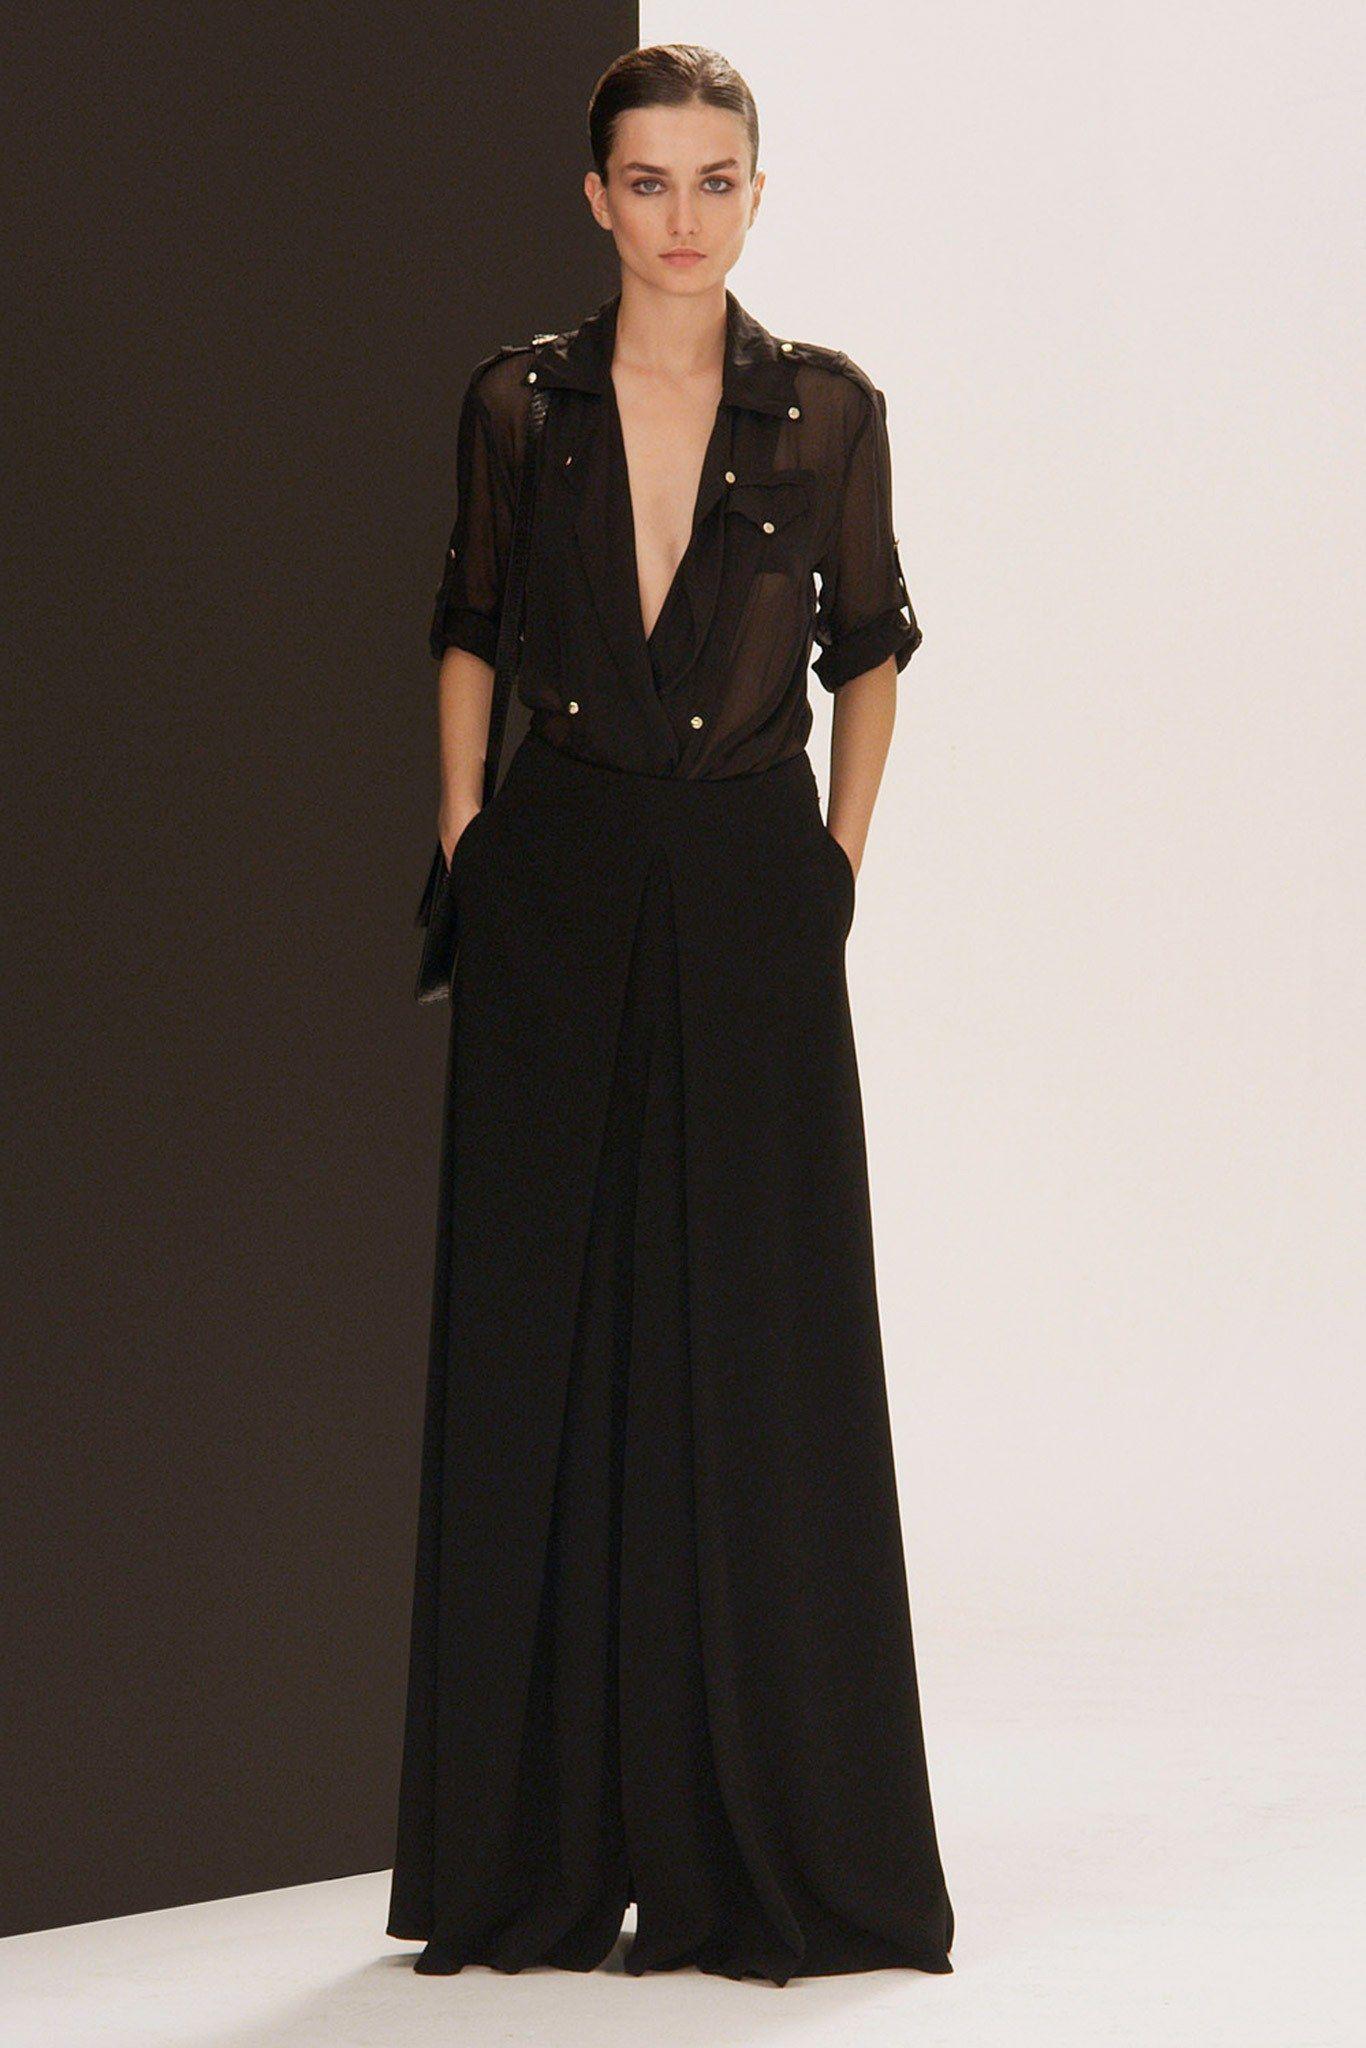 images Pierre Balmain FallWinter 2013-2014 RTW – New York Fashion Week